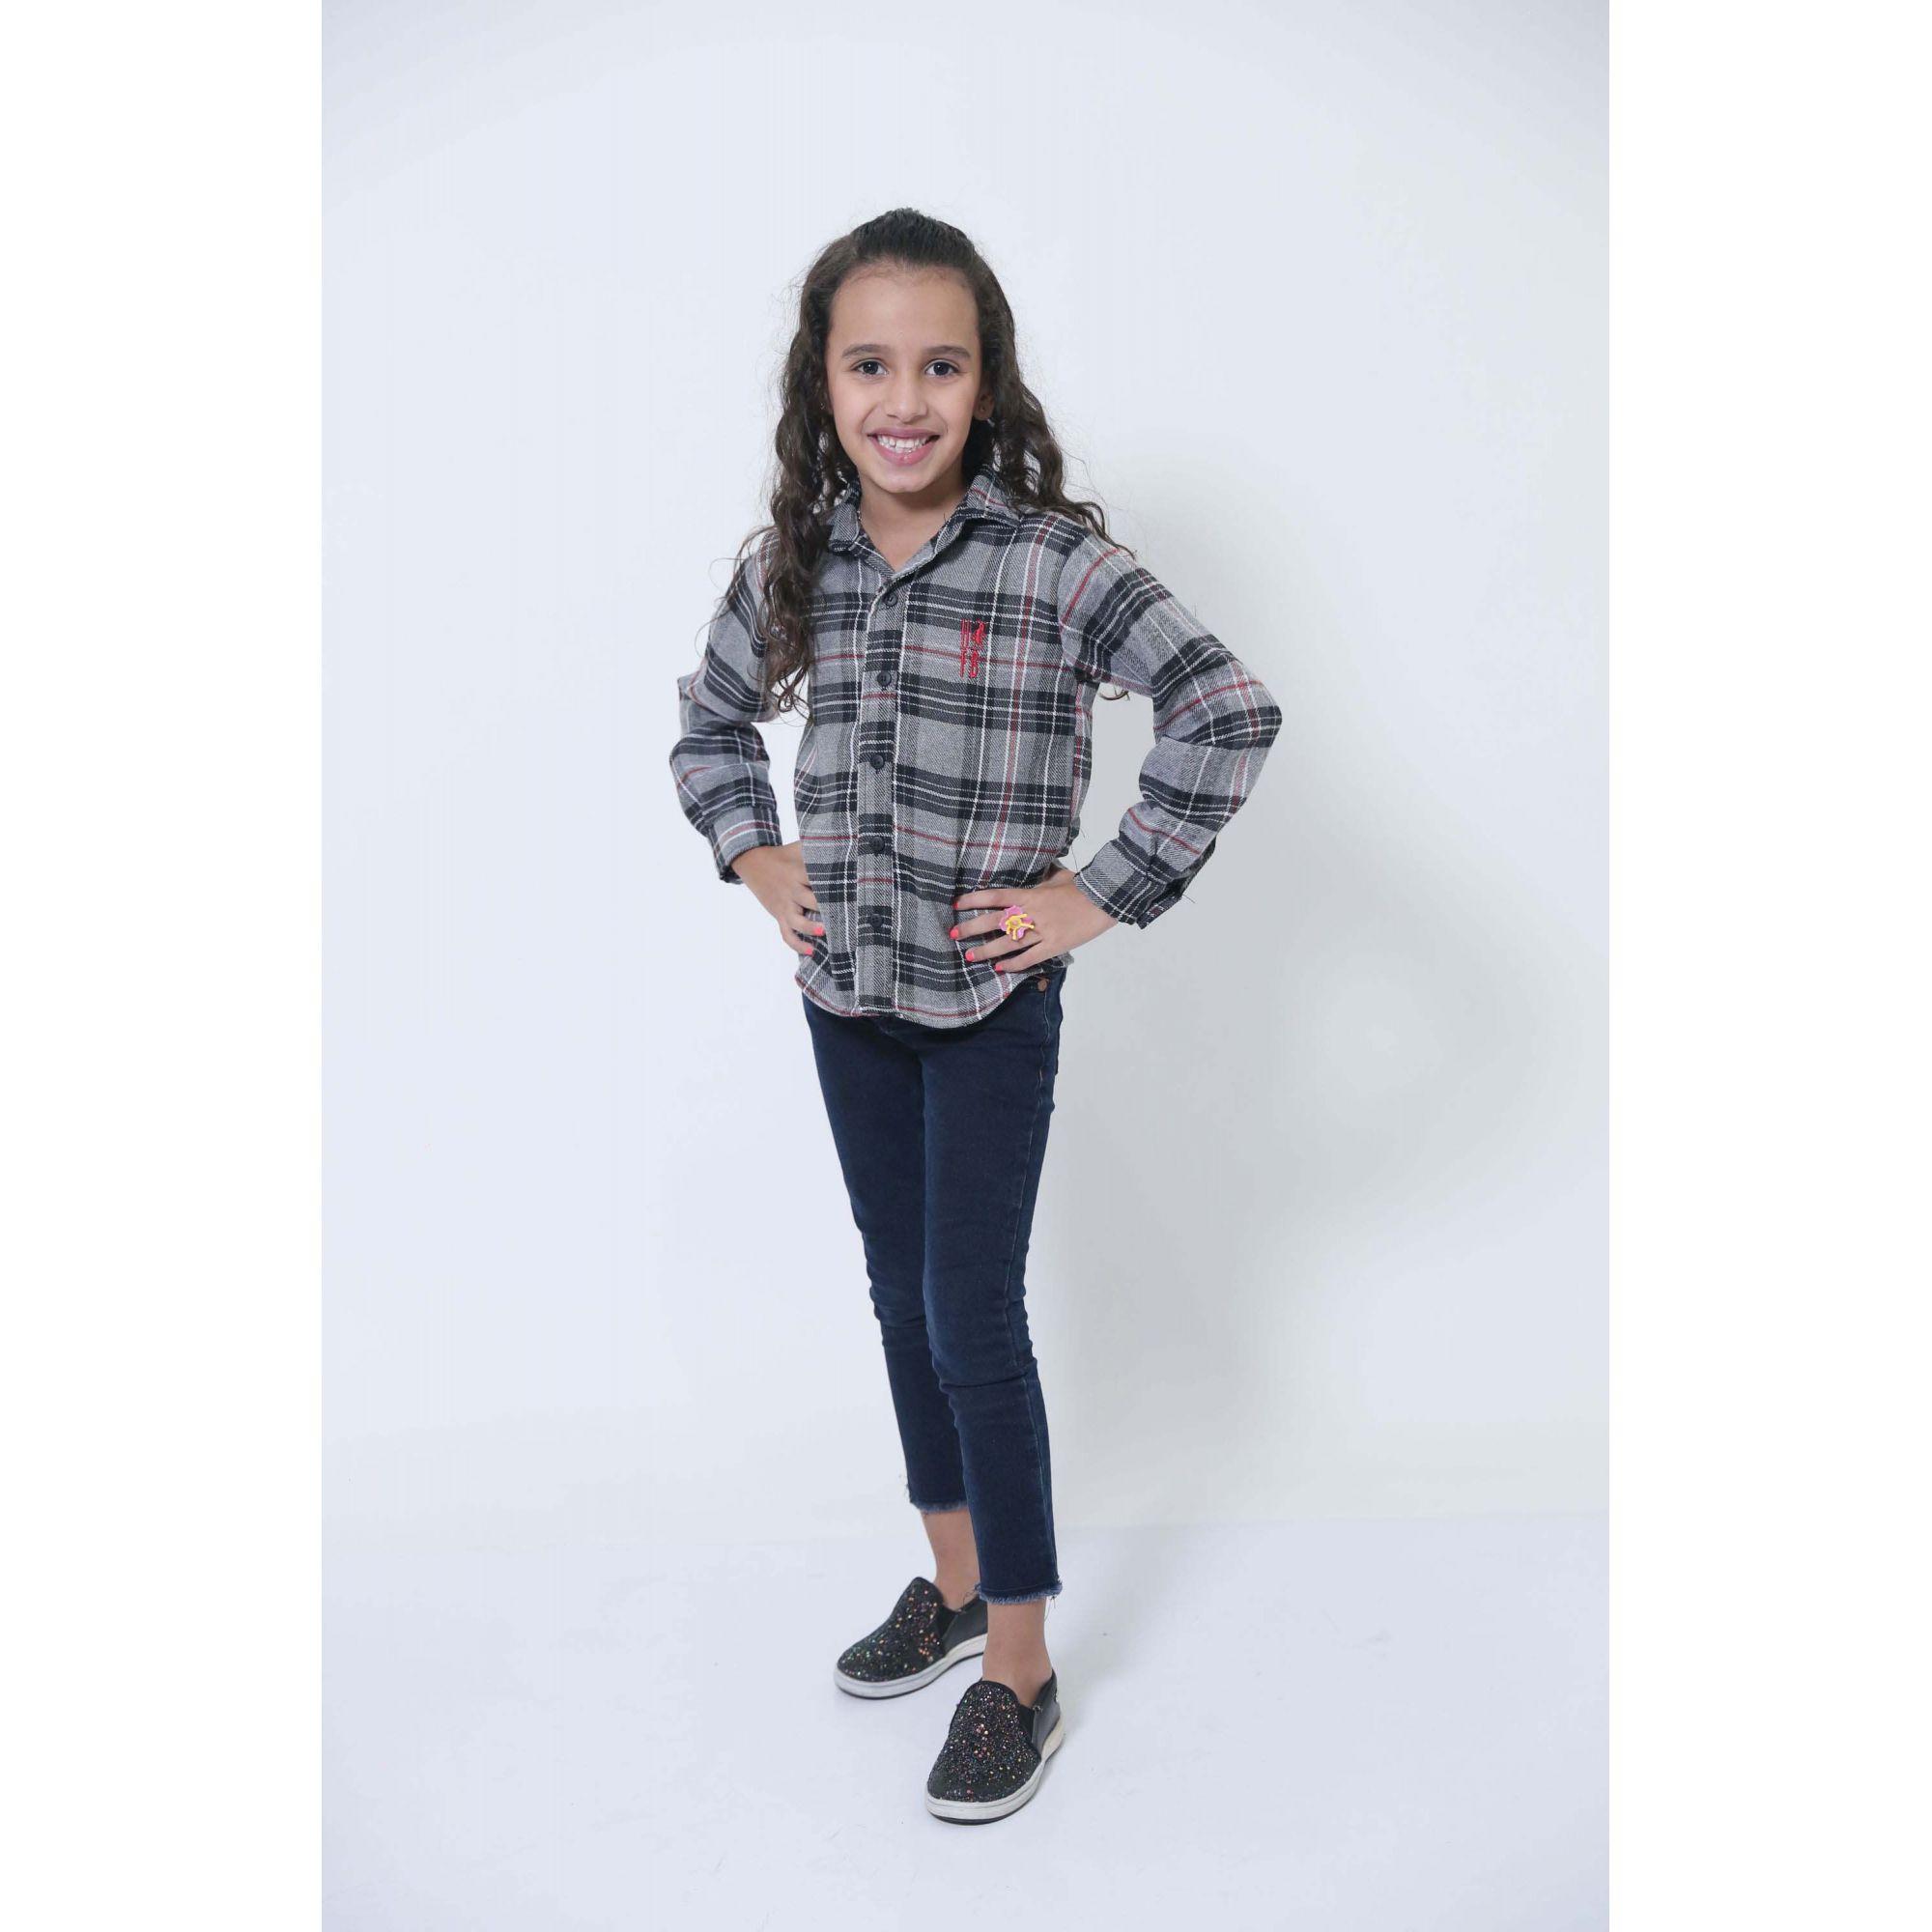 Camisa Social Xadrez Flanelada Urso Infantil  - Heitor Fashion Brazil